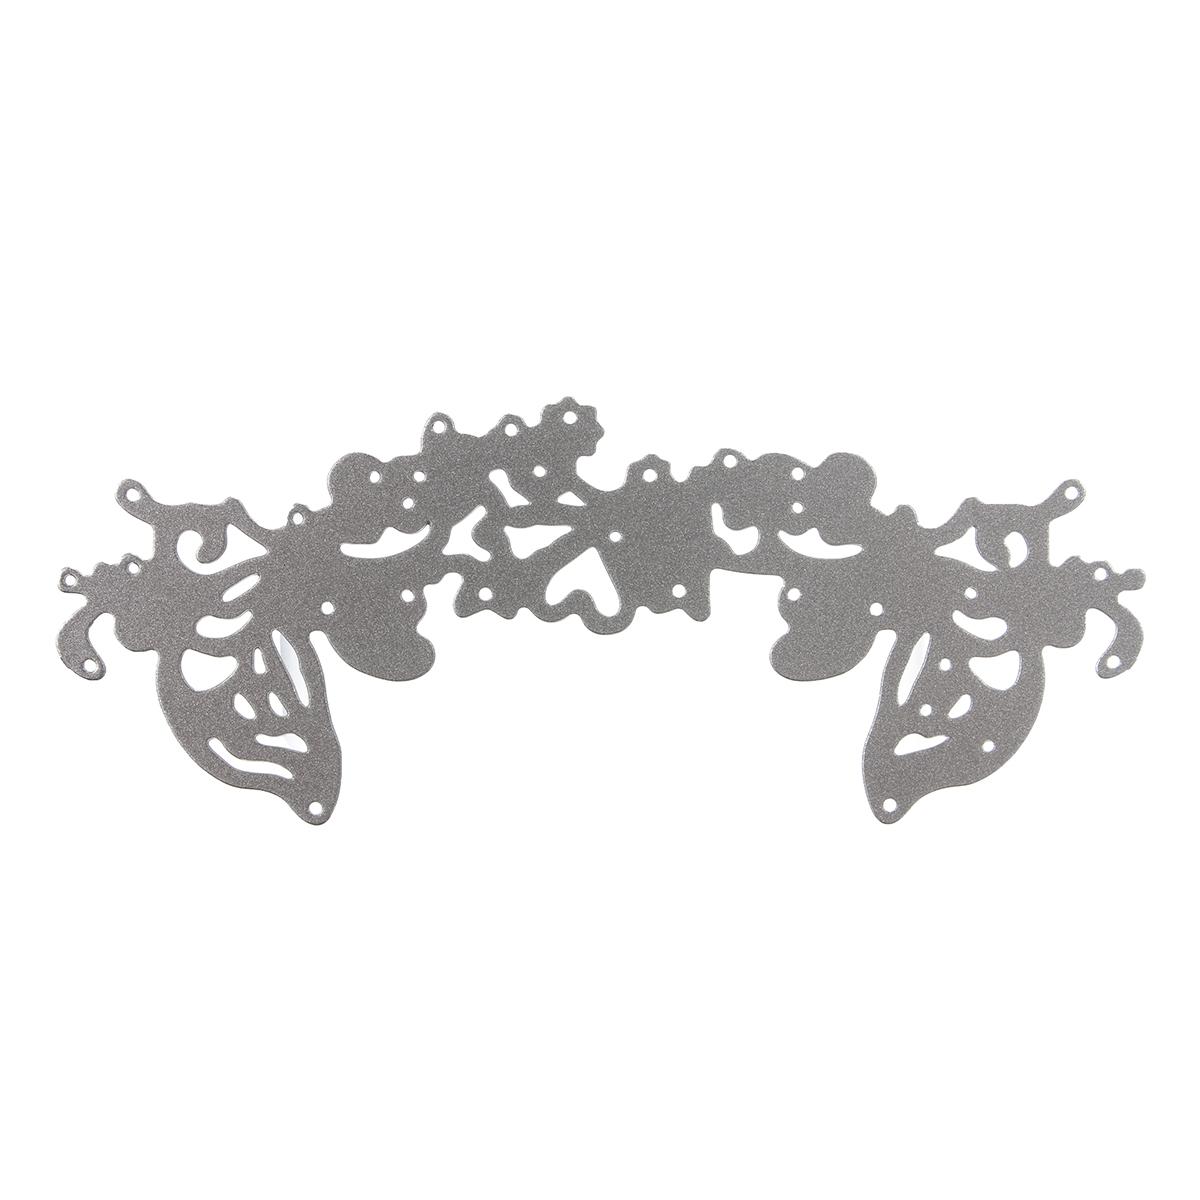 Christmas-Xmas-Metal-Cutting-Dies-Stencil-Scrapbooking-Embossing-DIY-Paper-Craft